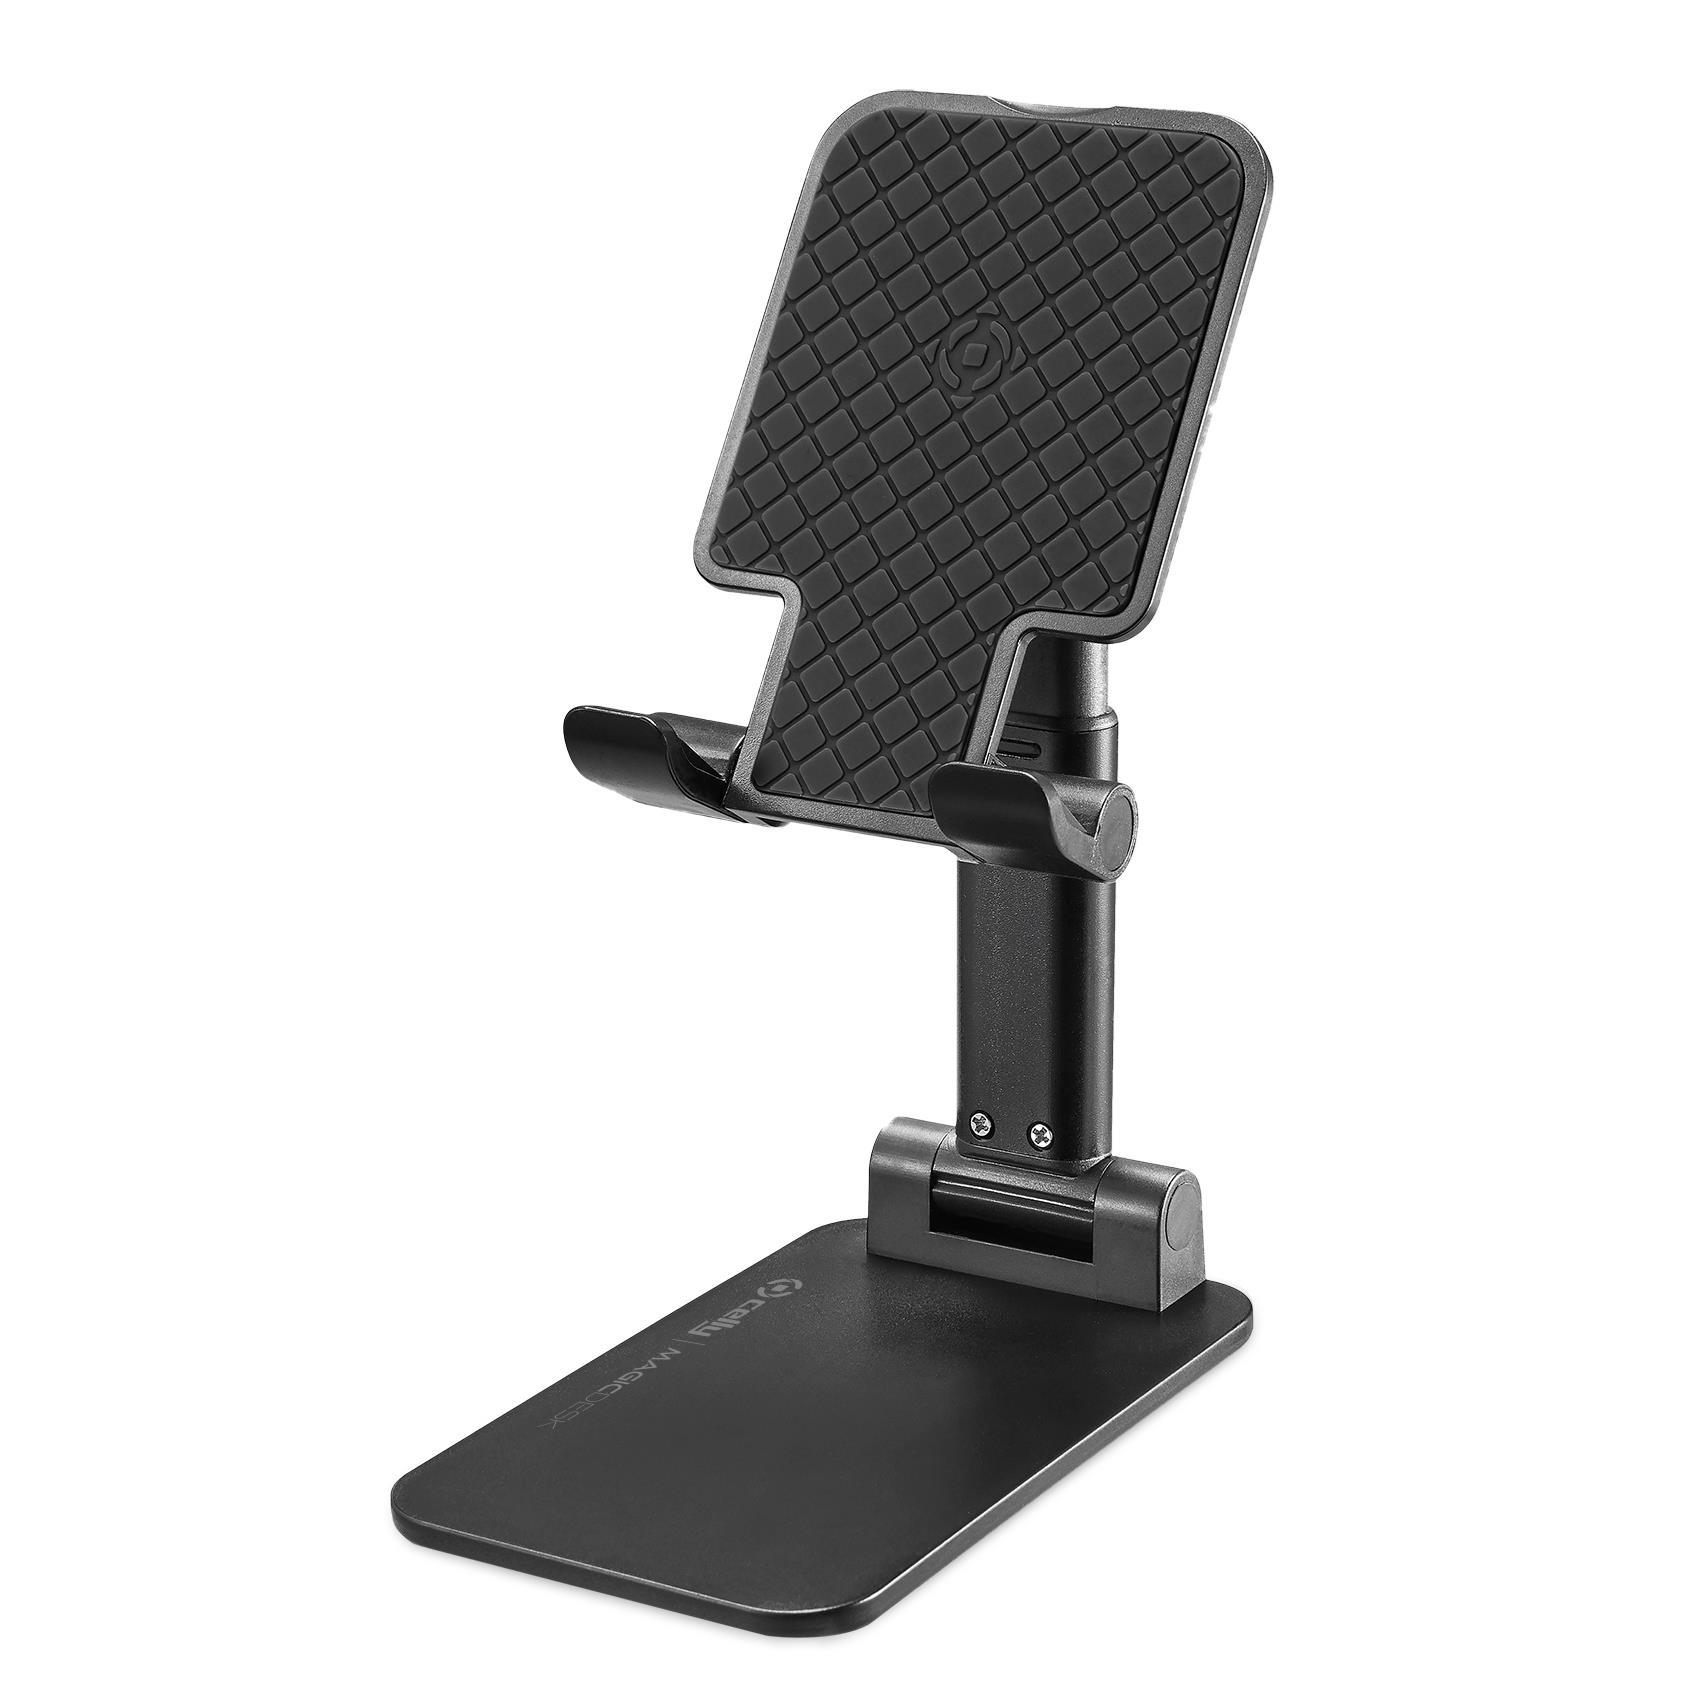 MAGIC DESK - Portable Magic Desk Holder [SMART WORKING]